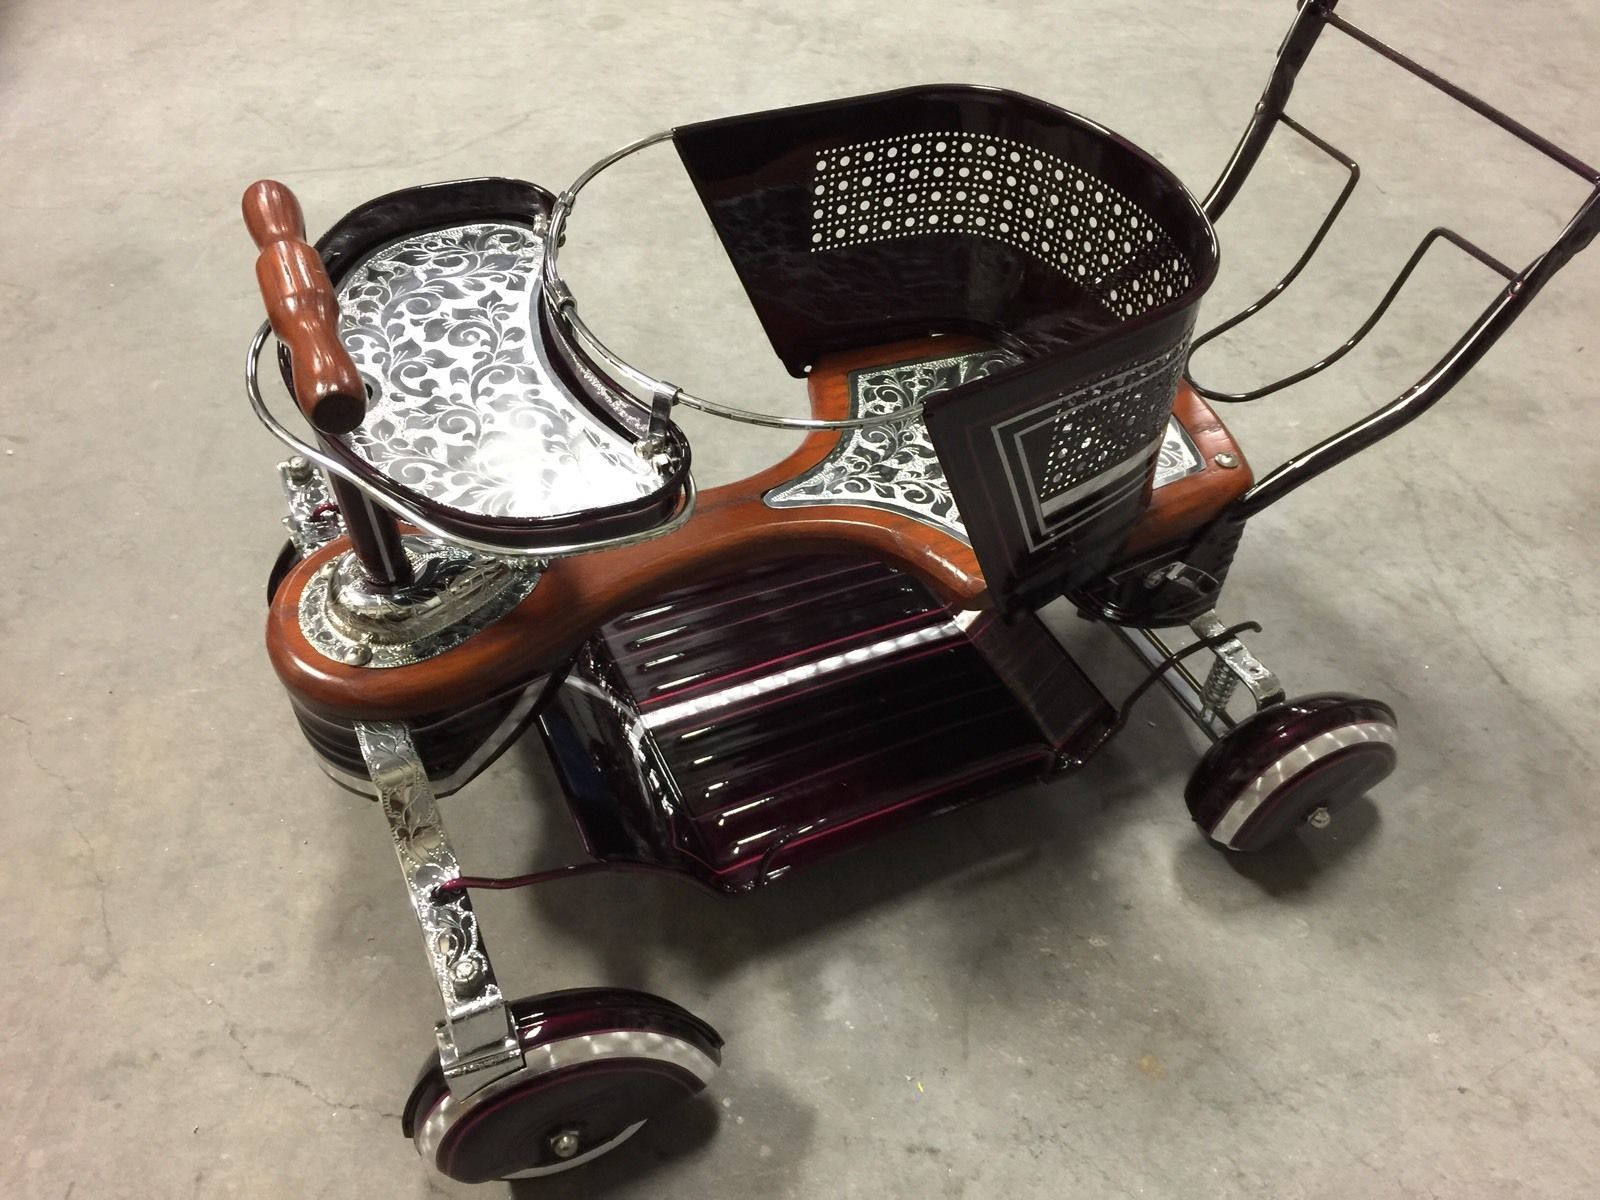 Custom Vintage 1950's Taylor Tot Baby Stroller eBay